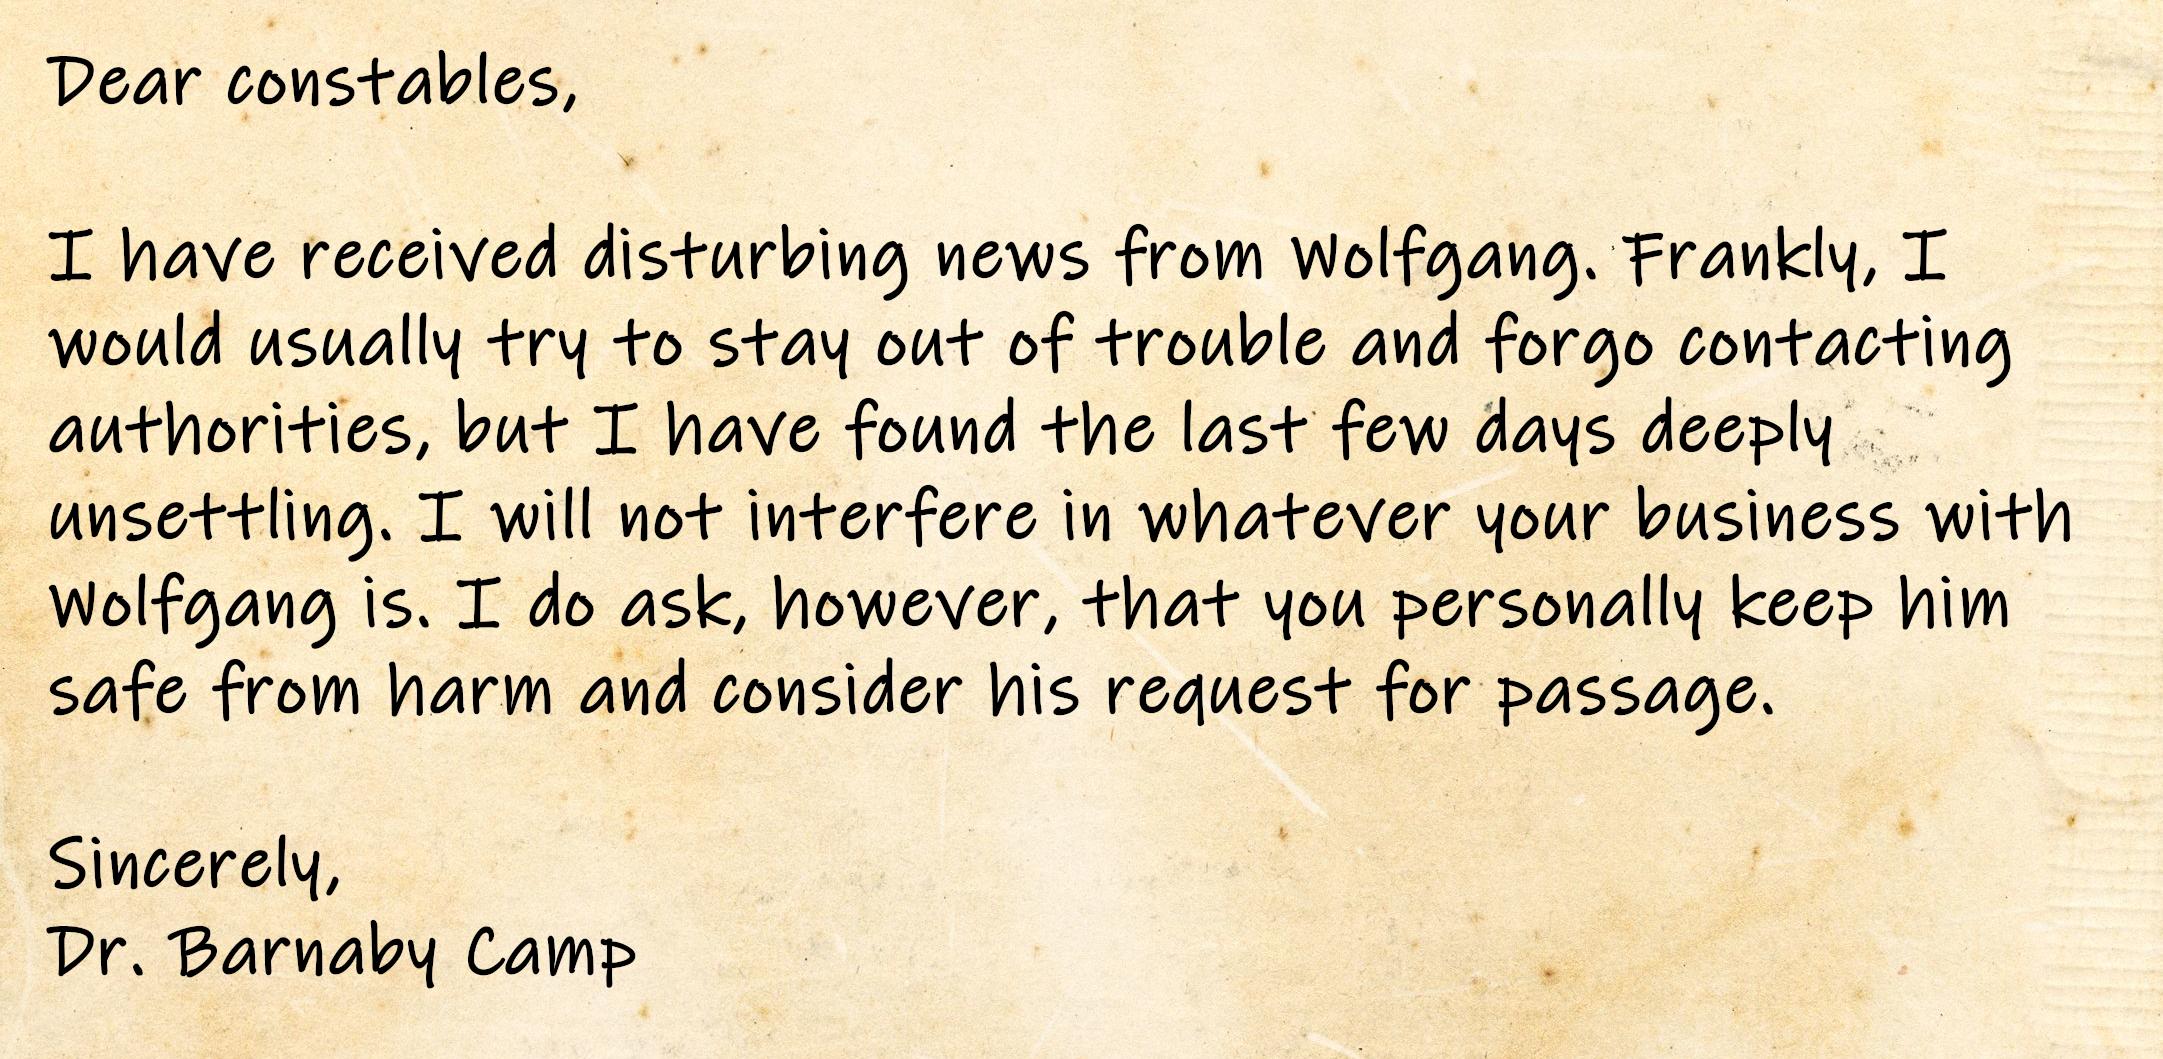 camp-letter.png